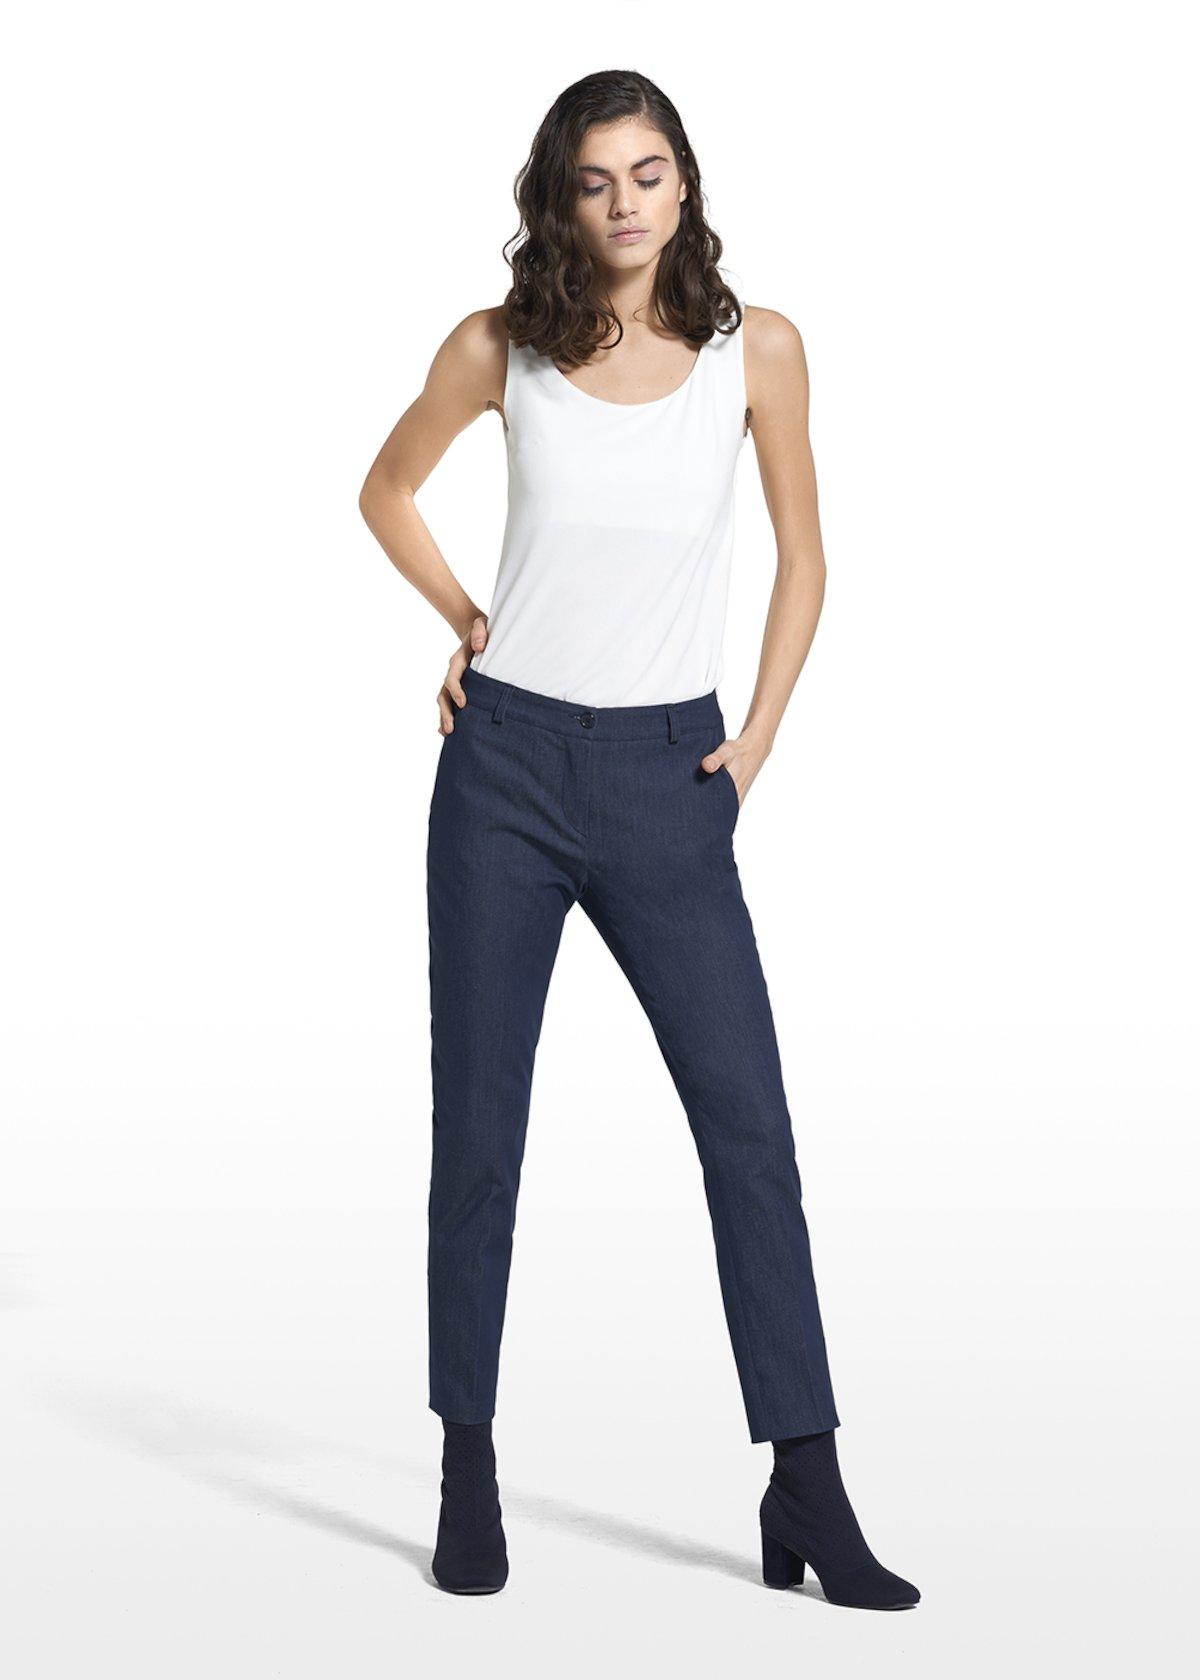 Pants Patrick with external broguing - Dark Denim - Woman - Category image